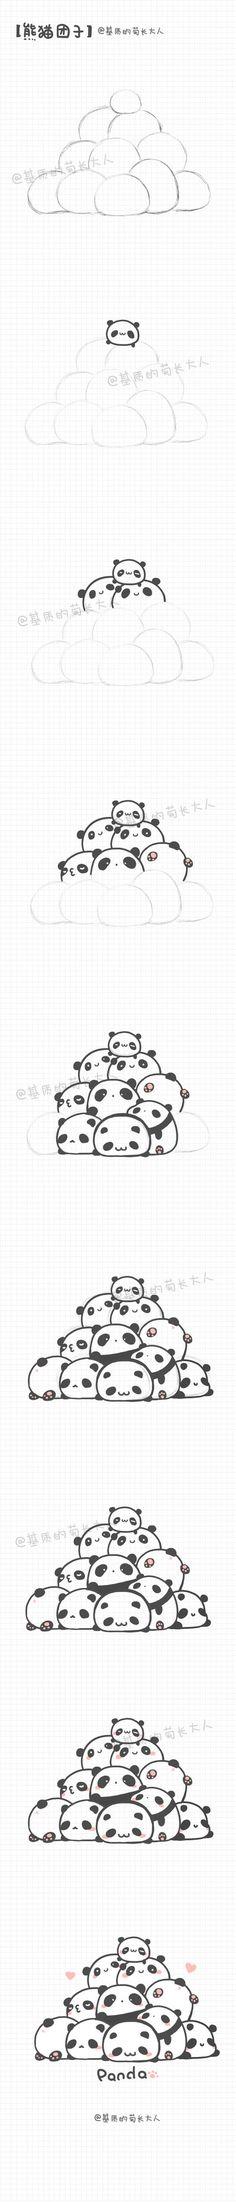 Panda pile drawing